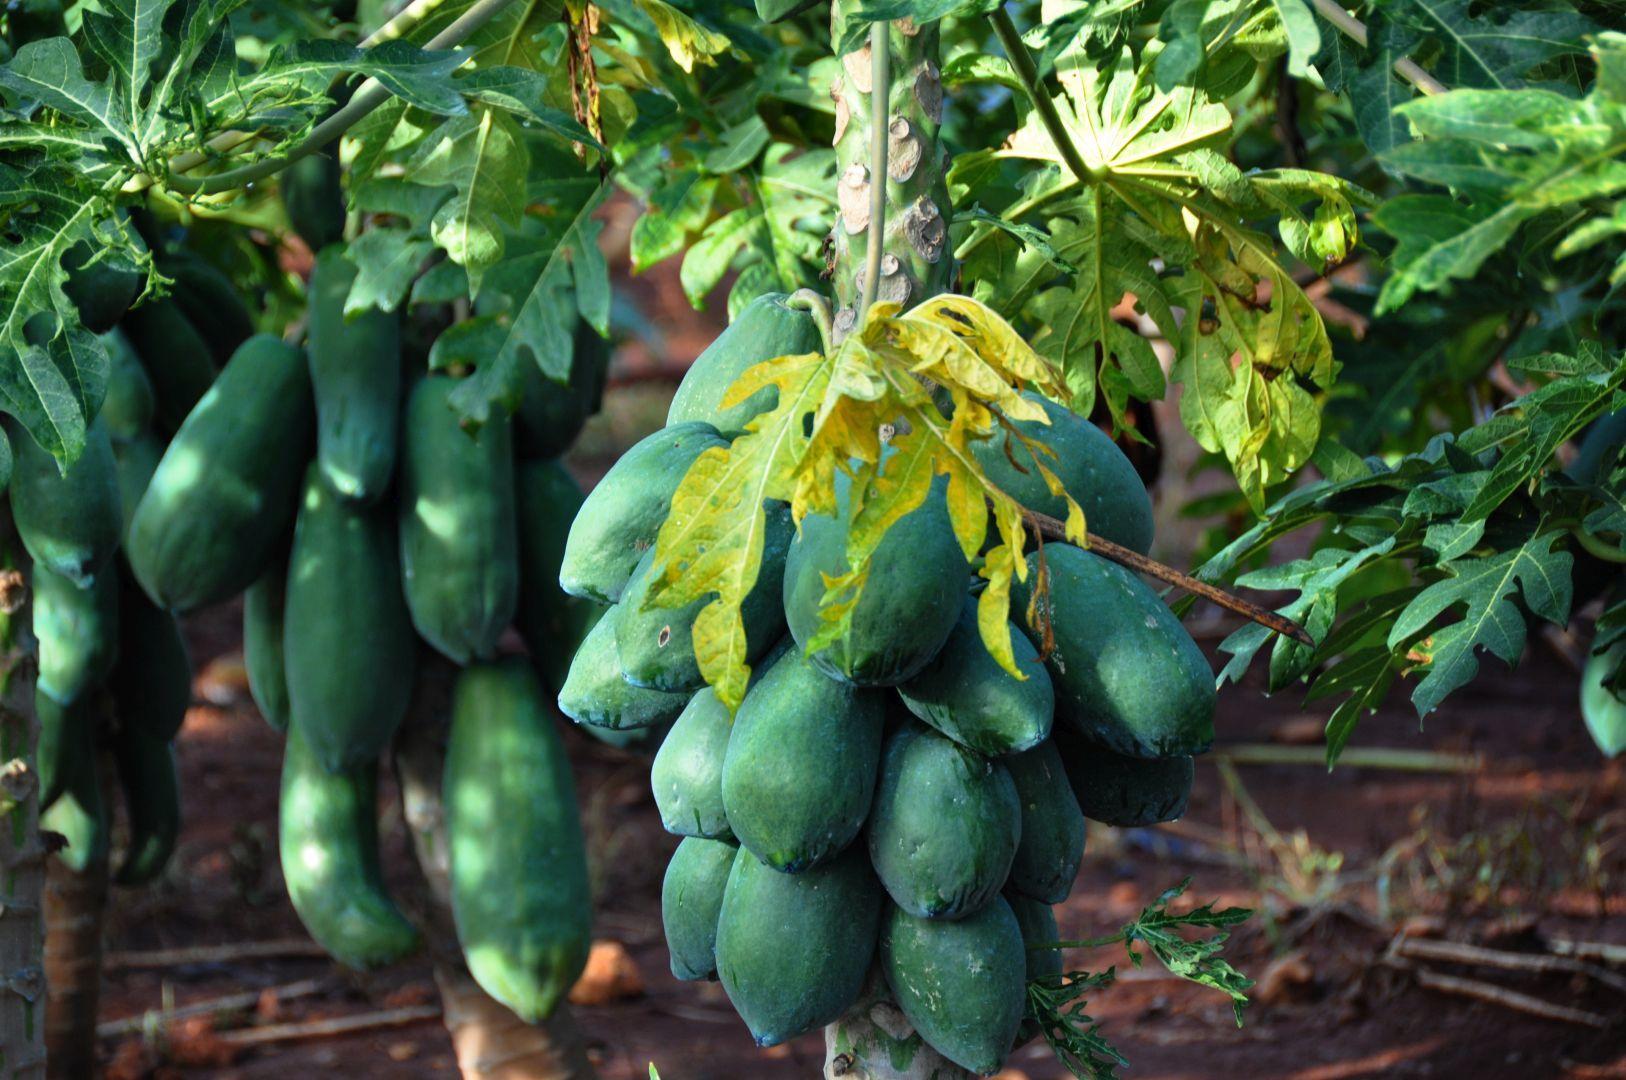 fruta bomba (papaya)